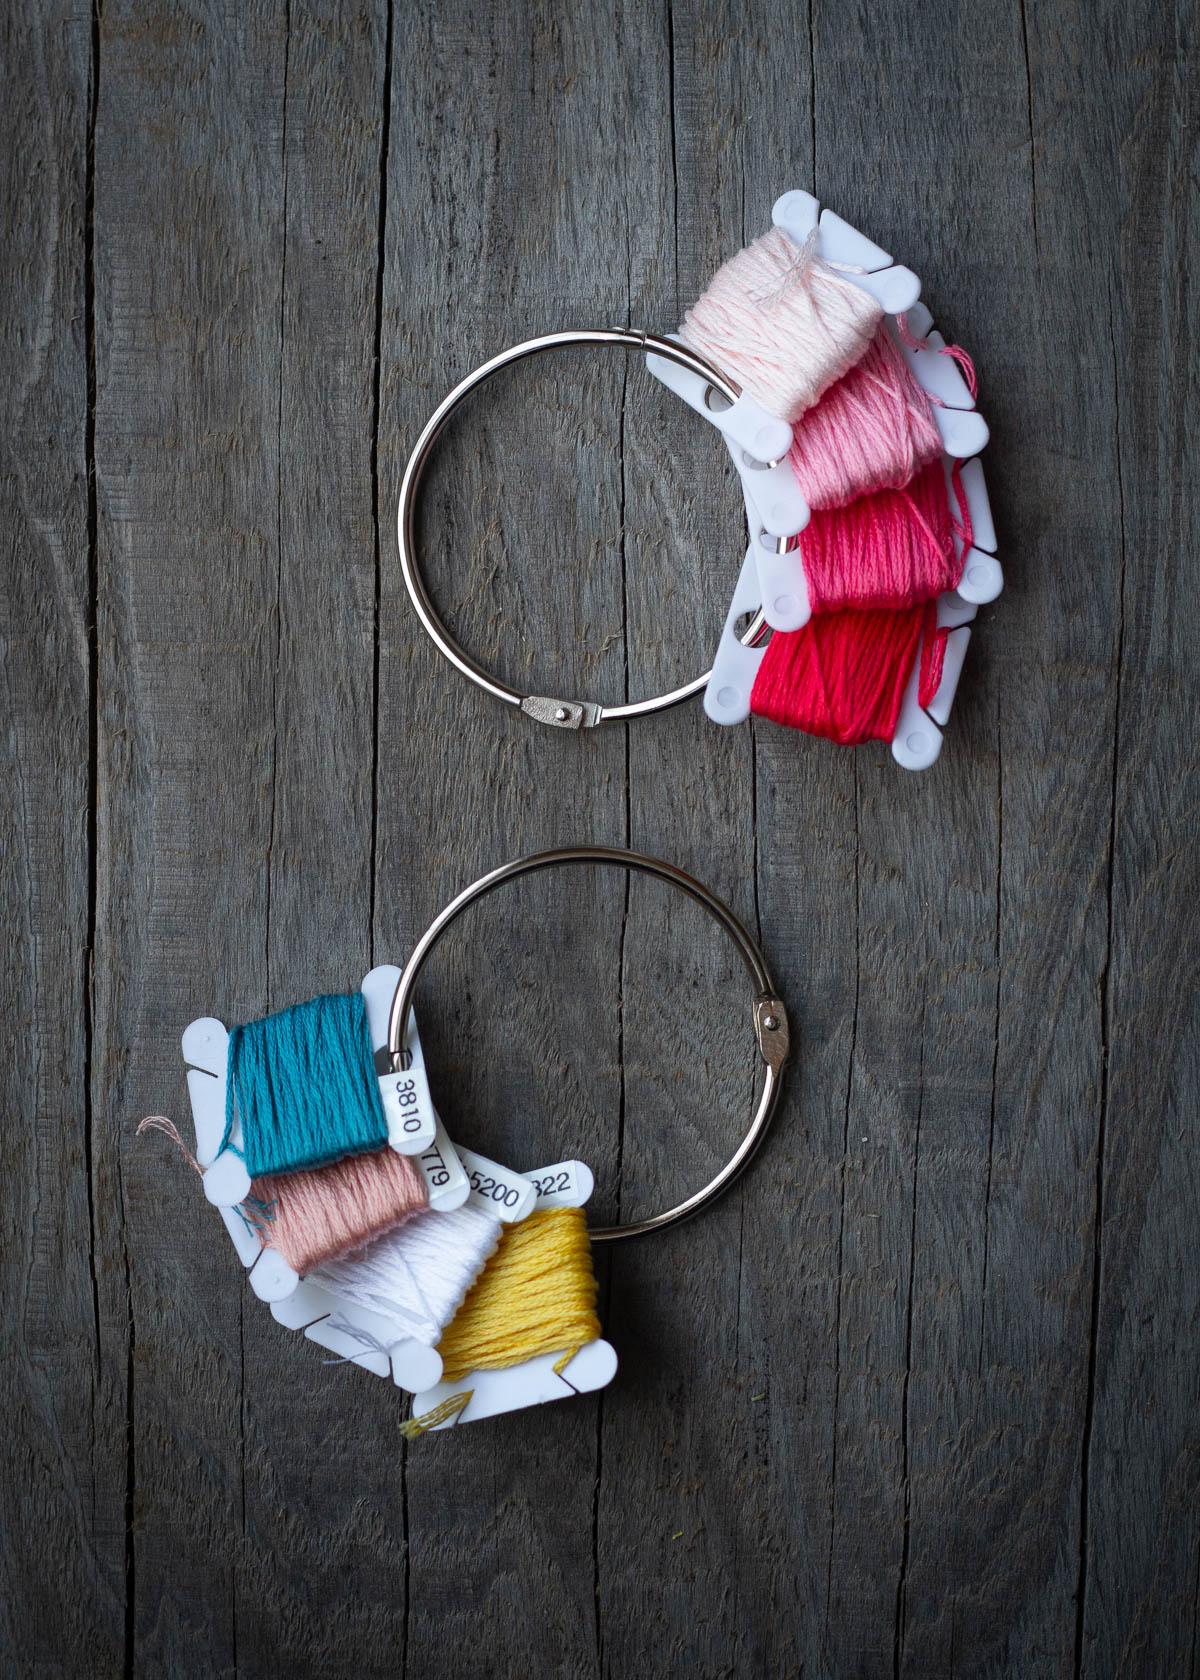 embroidery kit-floss on rings.JPG